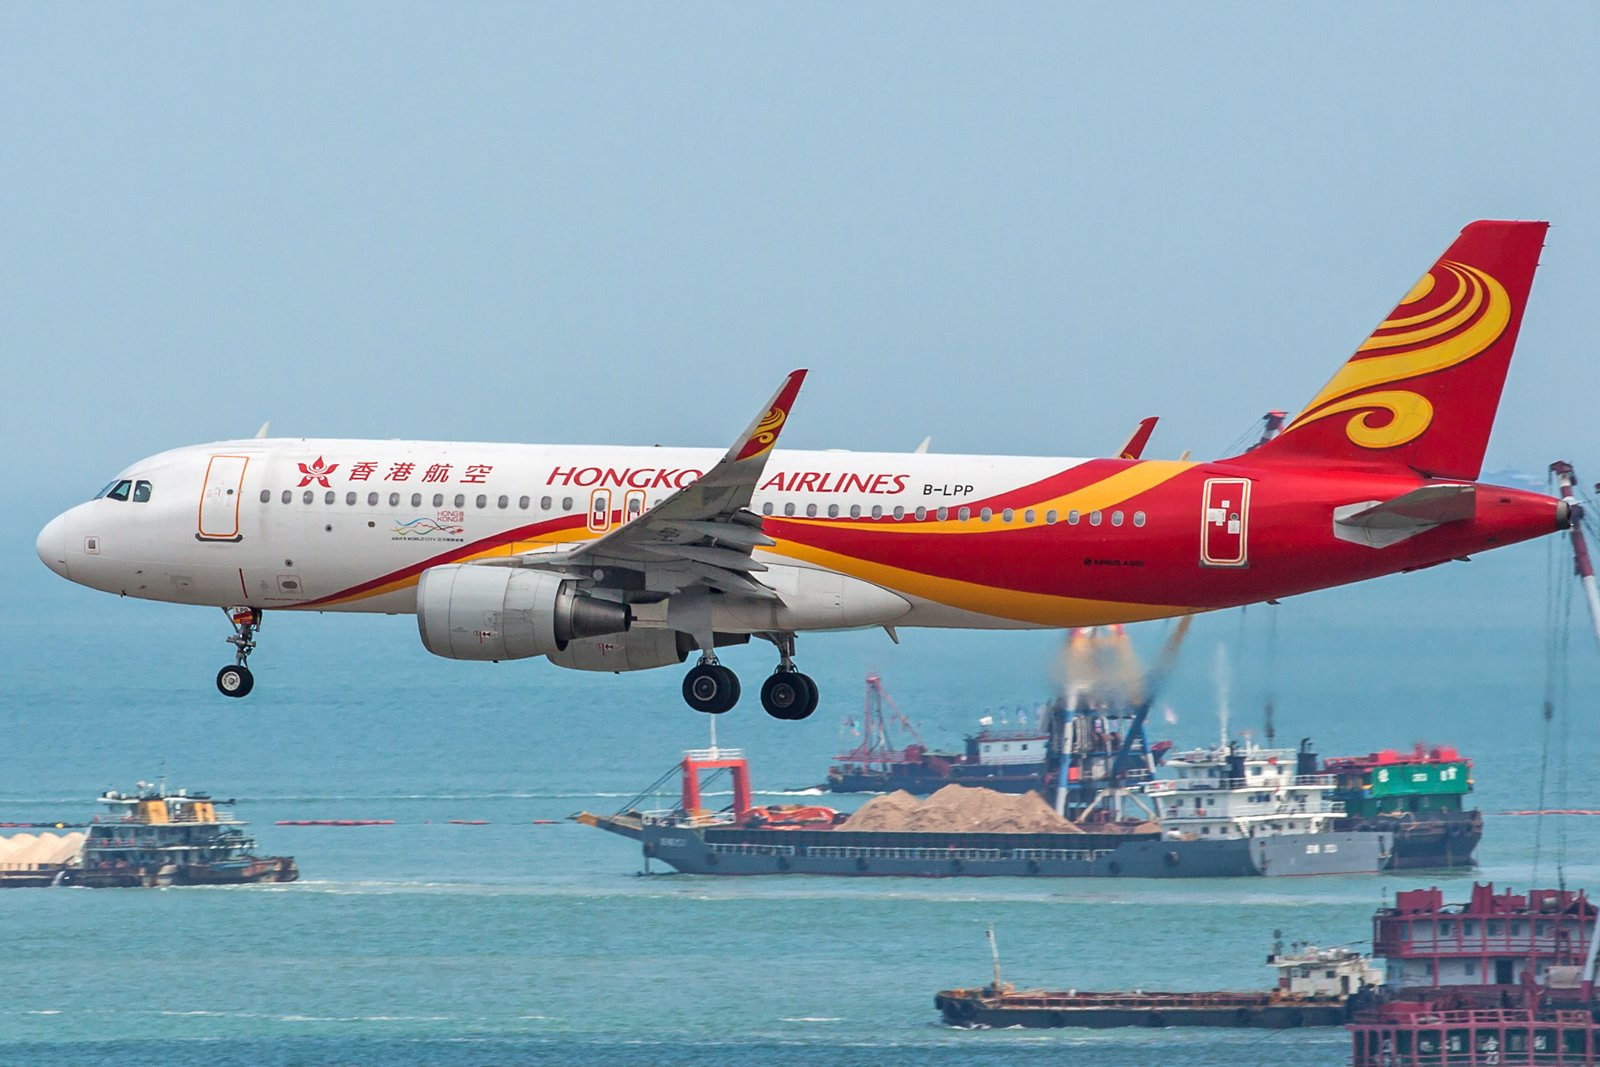 Hong Kong Airlines Airbus A320-214(WL) B-LPP